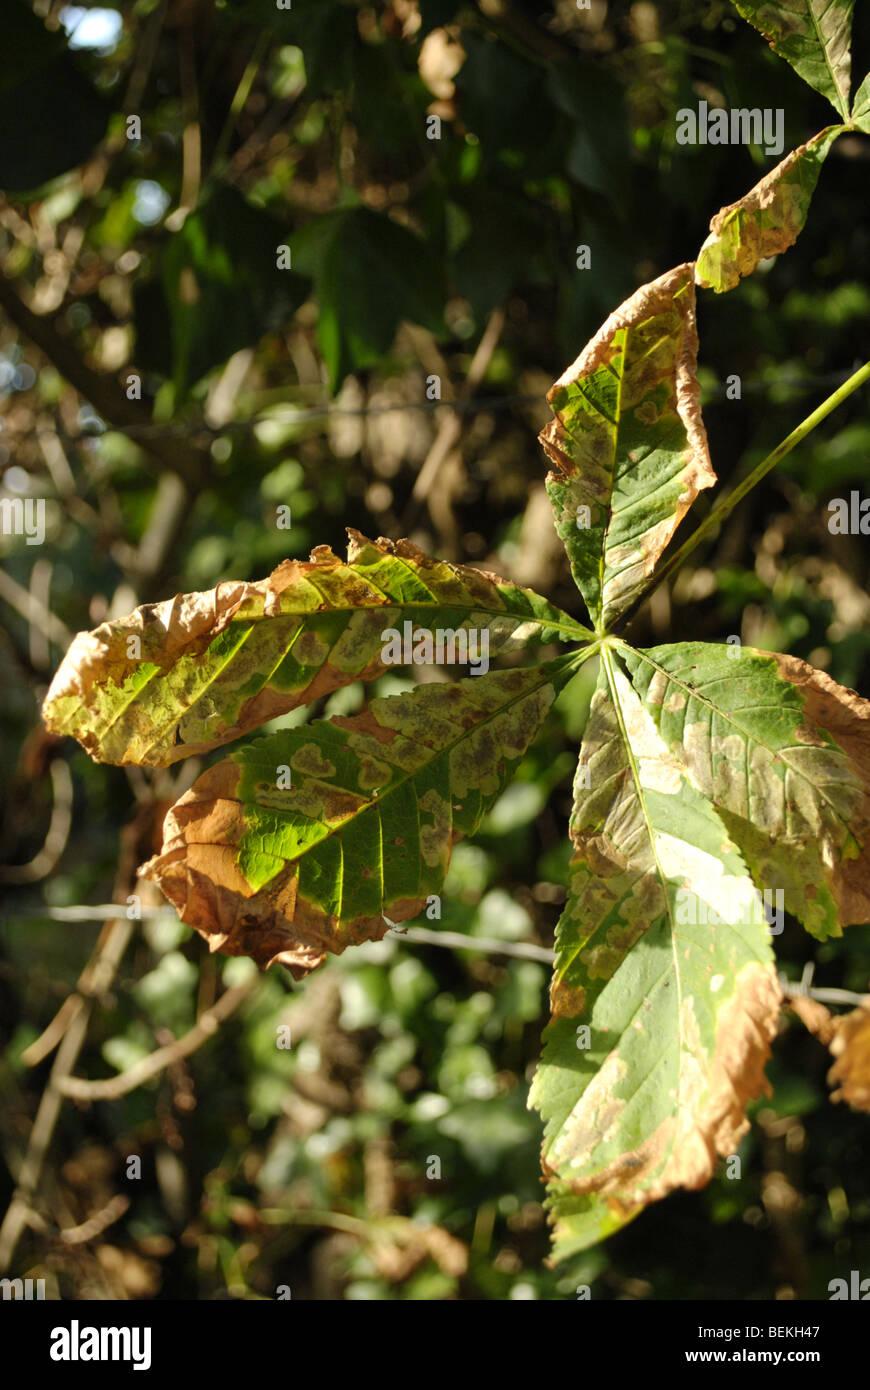 Diseased horse chestnut leaf - Stock Image